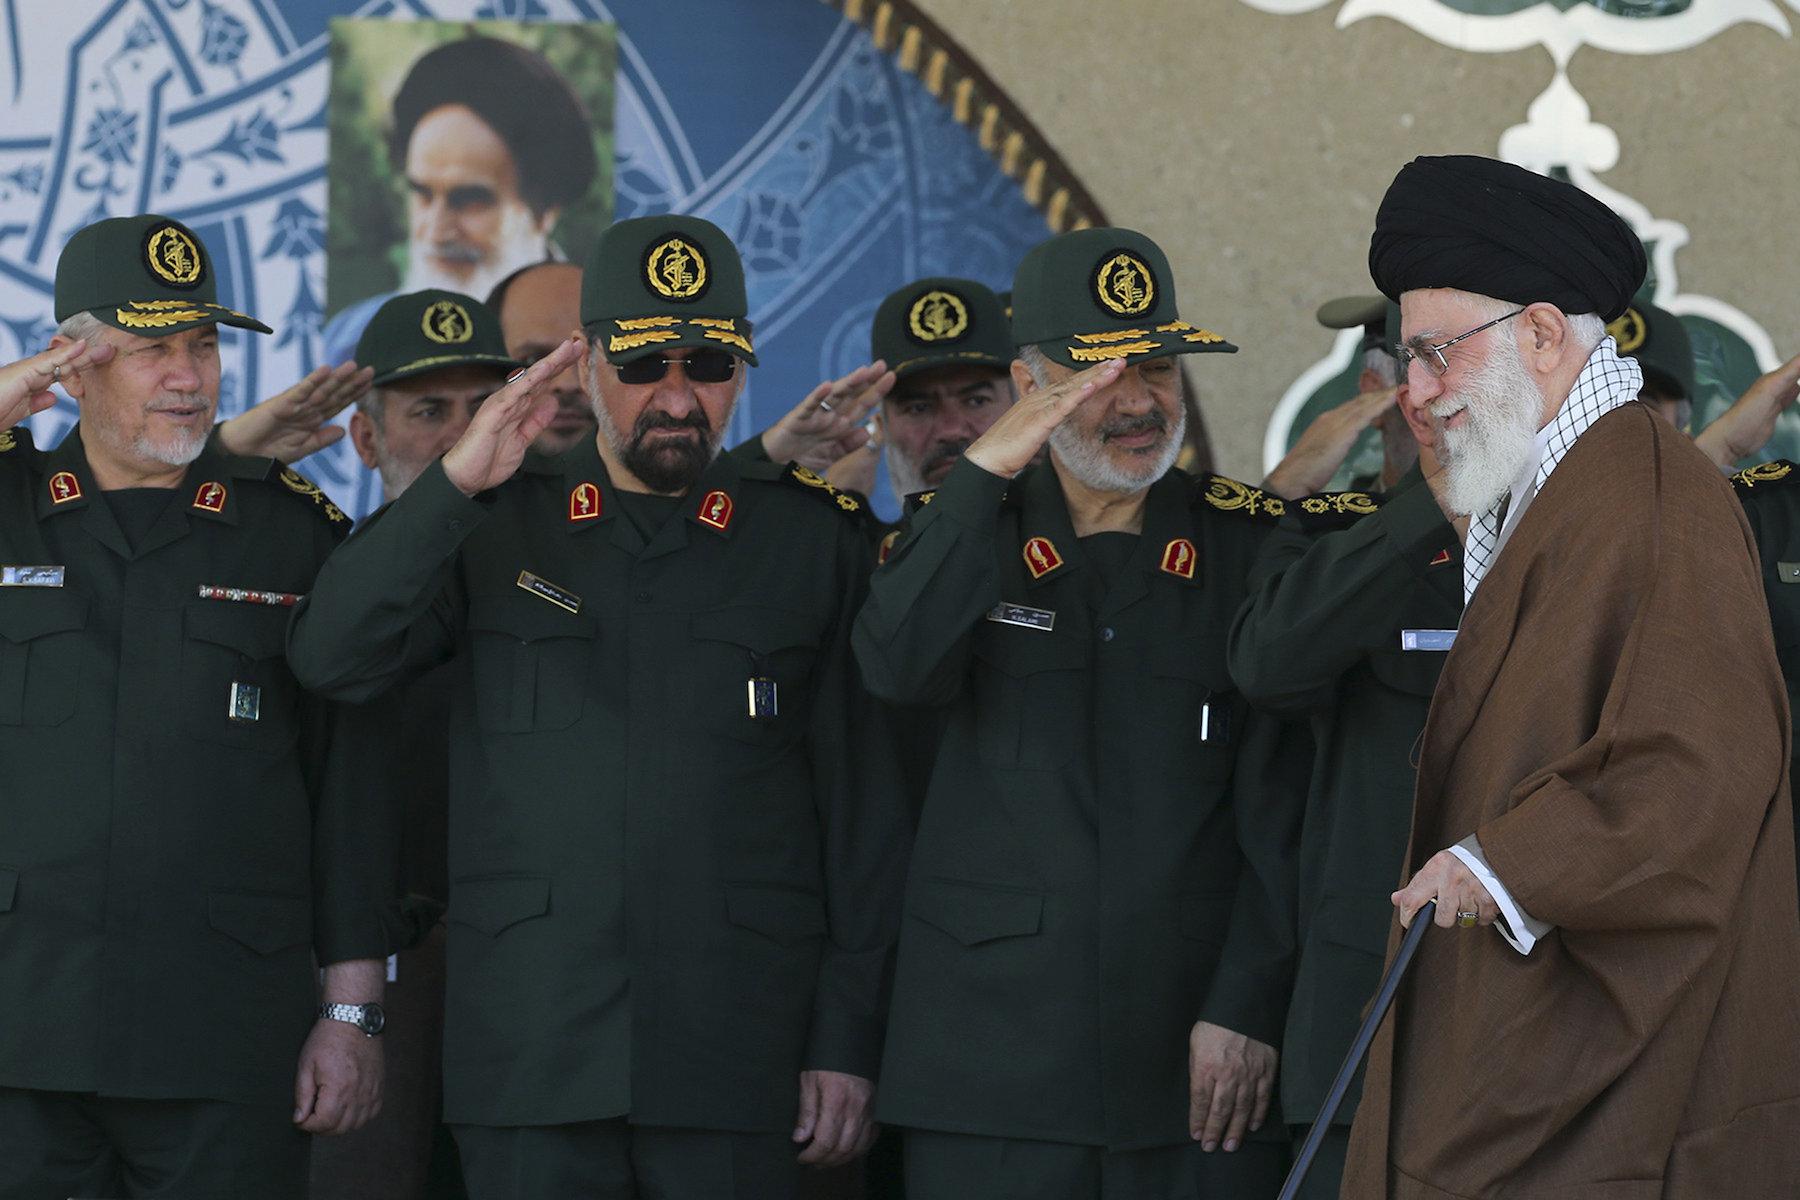 Ayatollah Khamenei and the IRGC